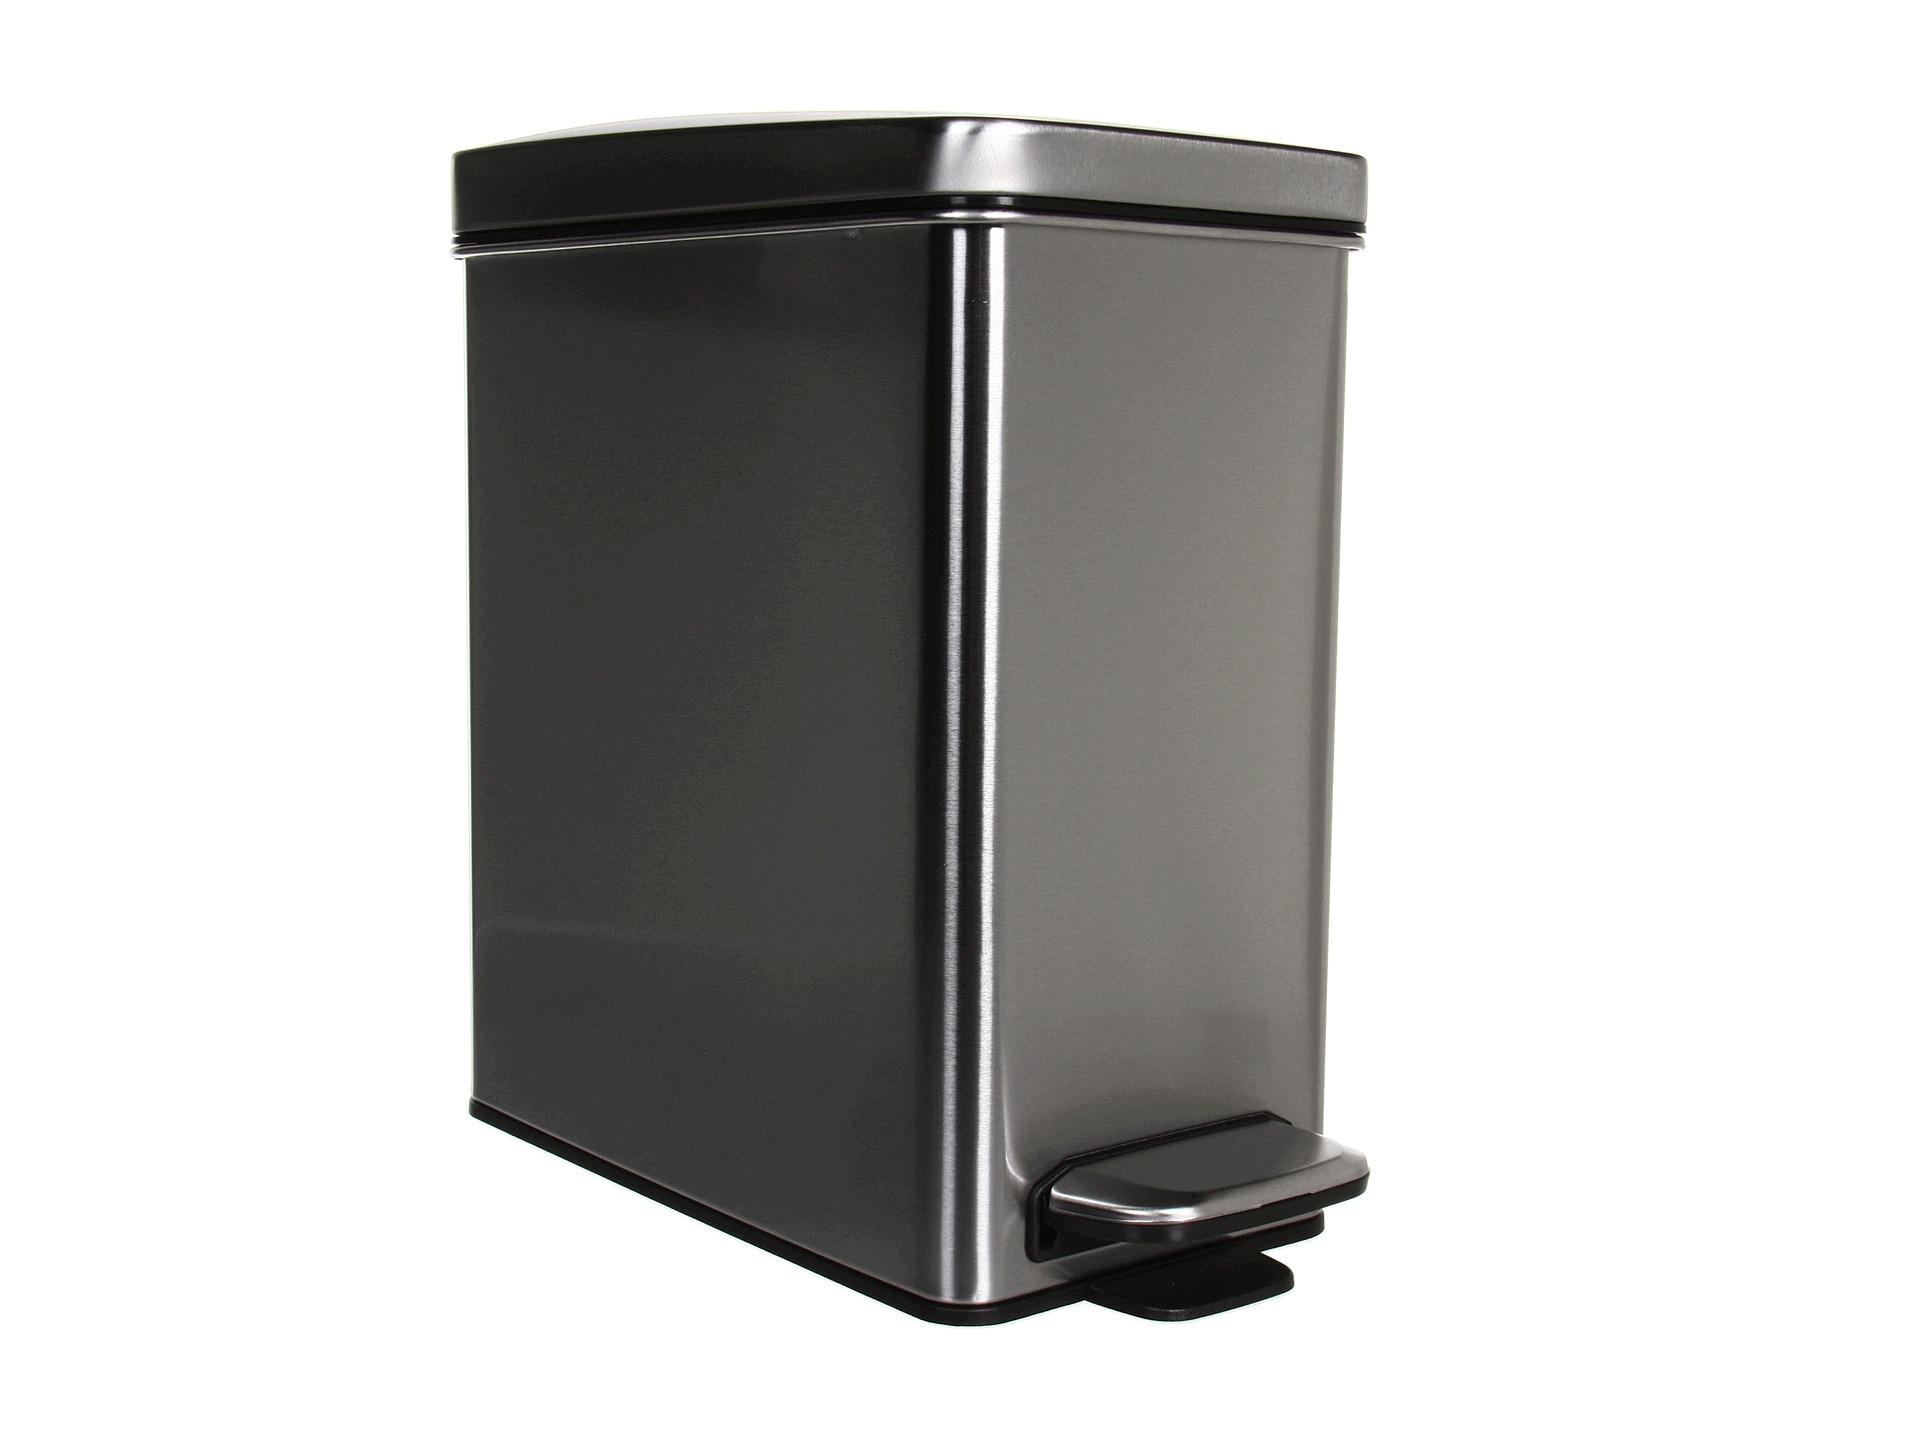 simplehuman trash can deals on 1001 blocks. Black Bedroom Furniture Sets. Home Design Ideas